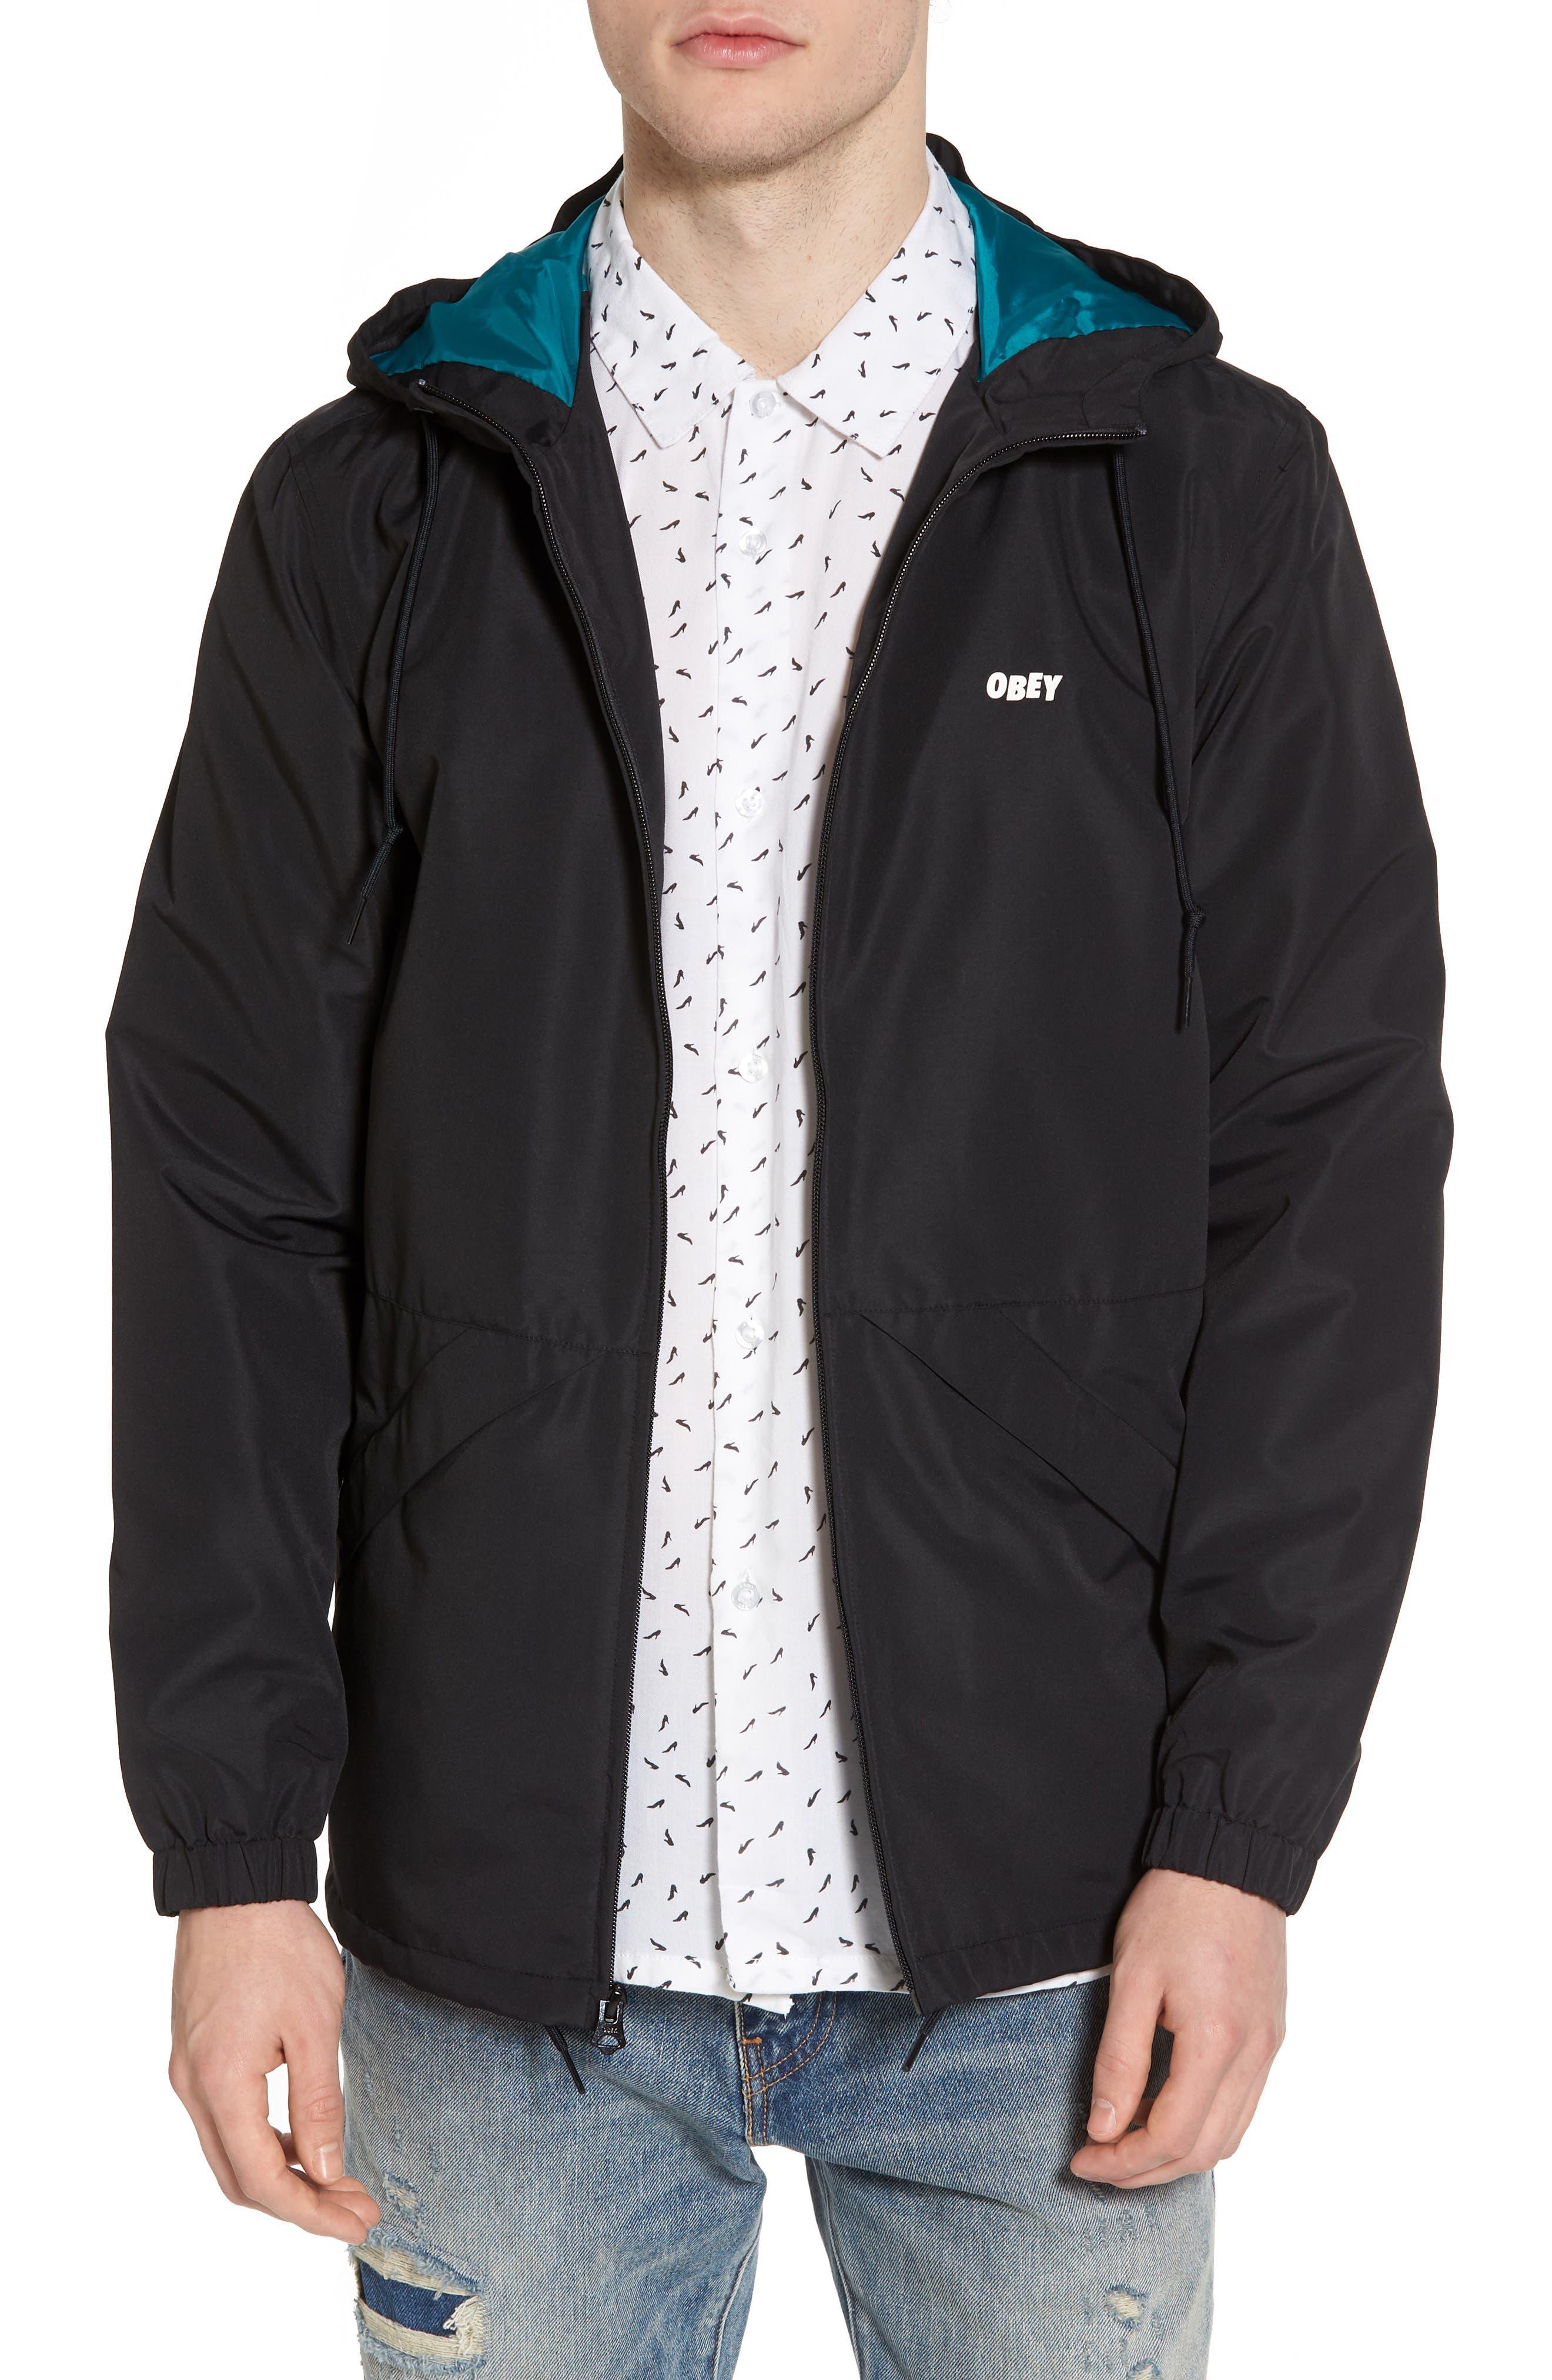 Ambush Hooded Jacket,                             Main thumbnail 1, color,                             Black